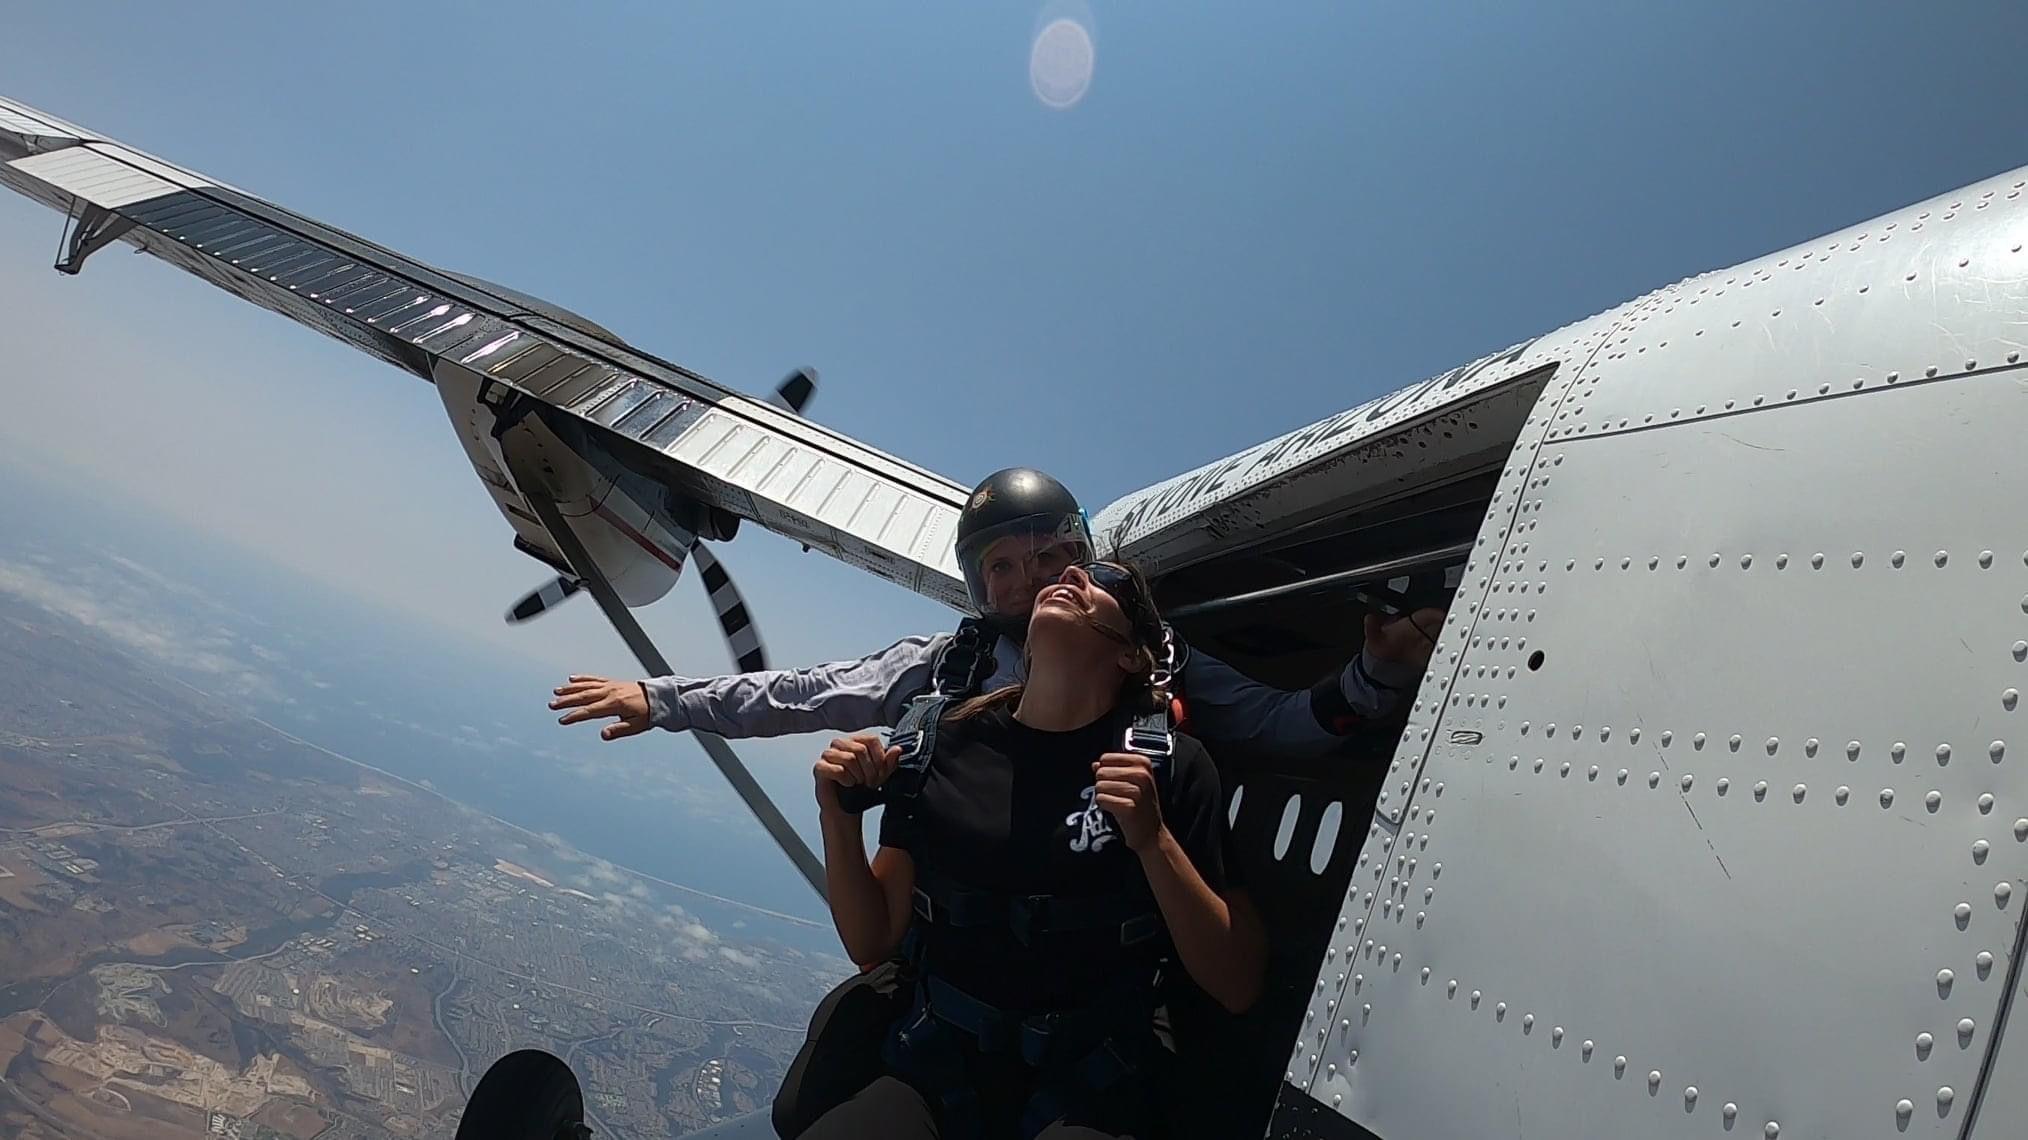 Tandem training at skydive san diego